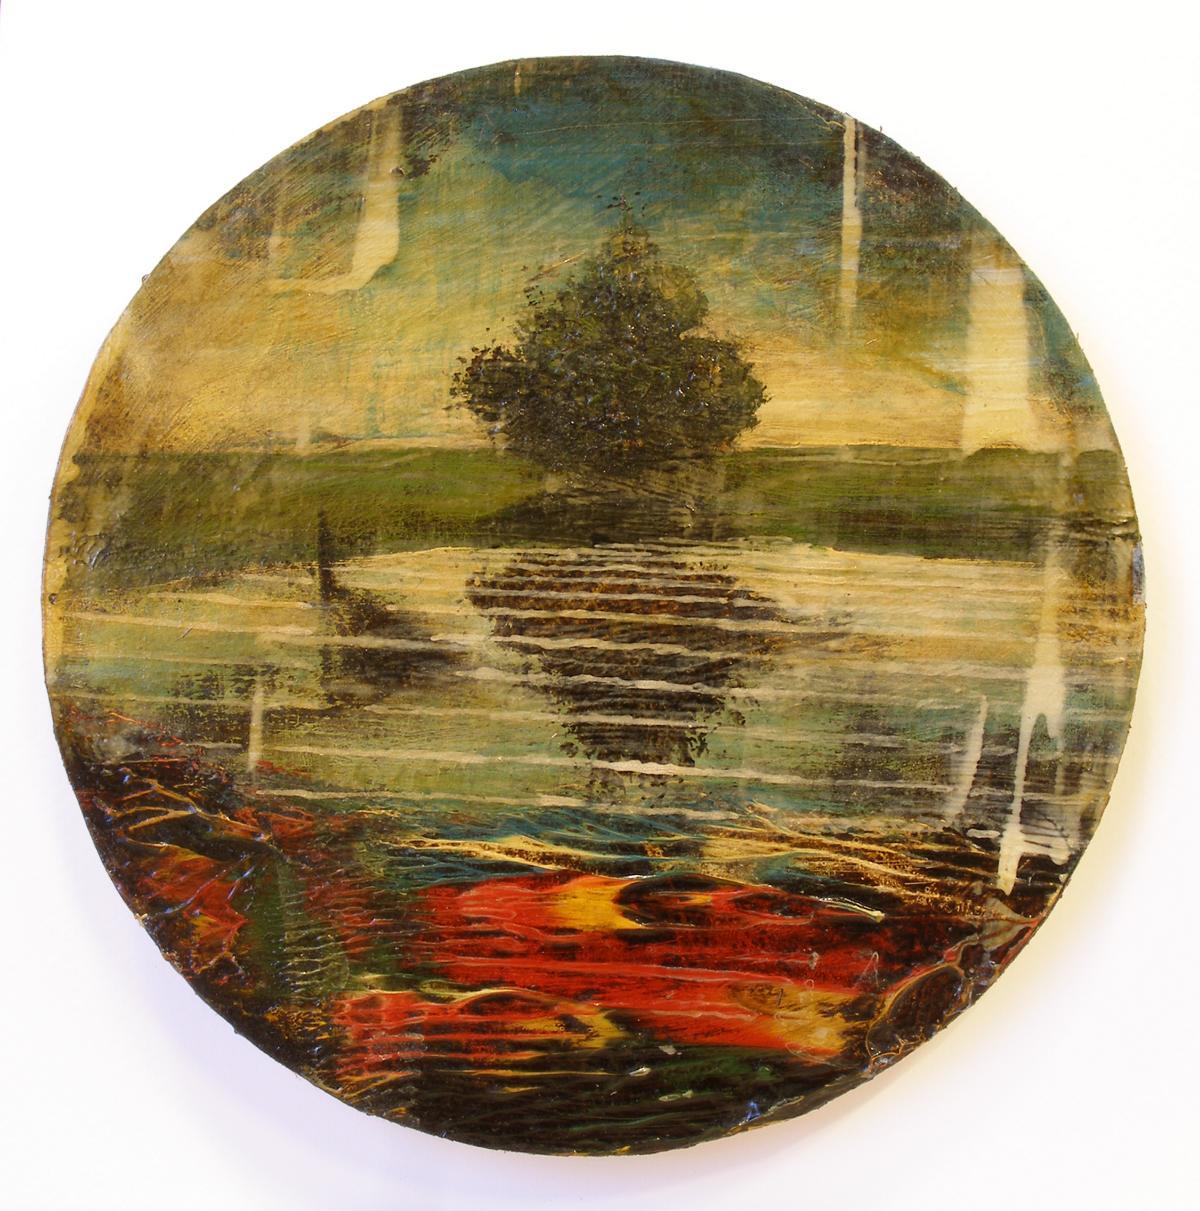 Jernej Forbici, auri sacra fames IX, diametro 20 cm, 2017, acrilico e olio su carta